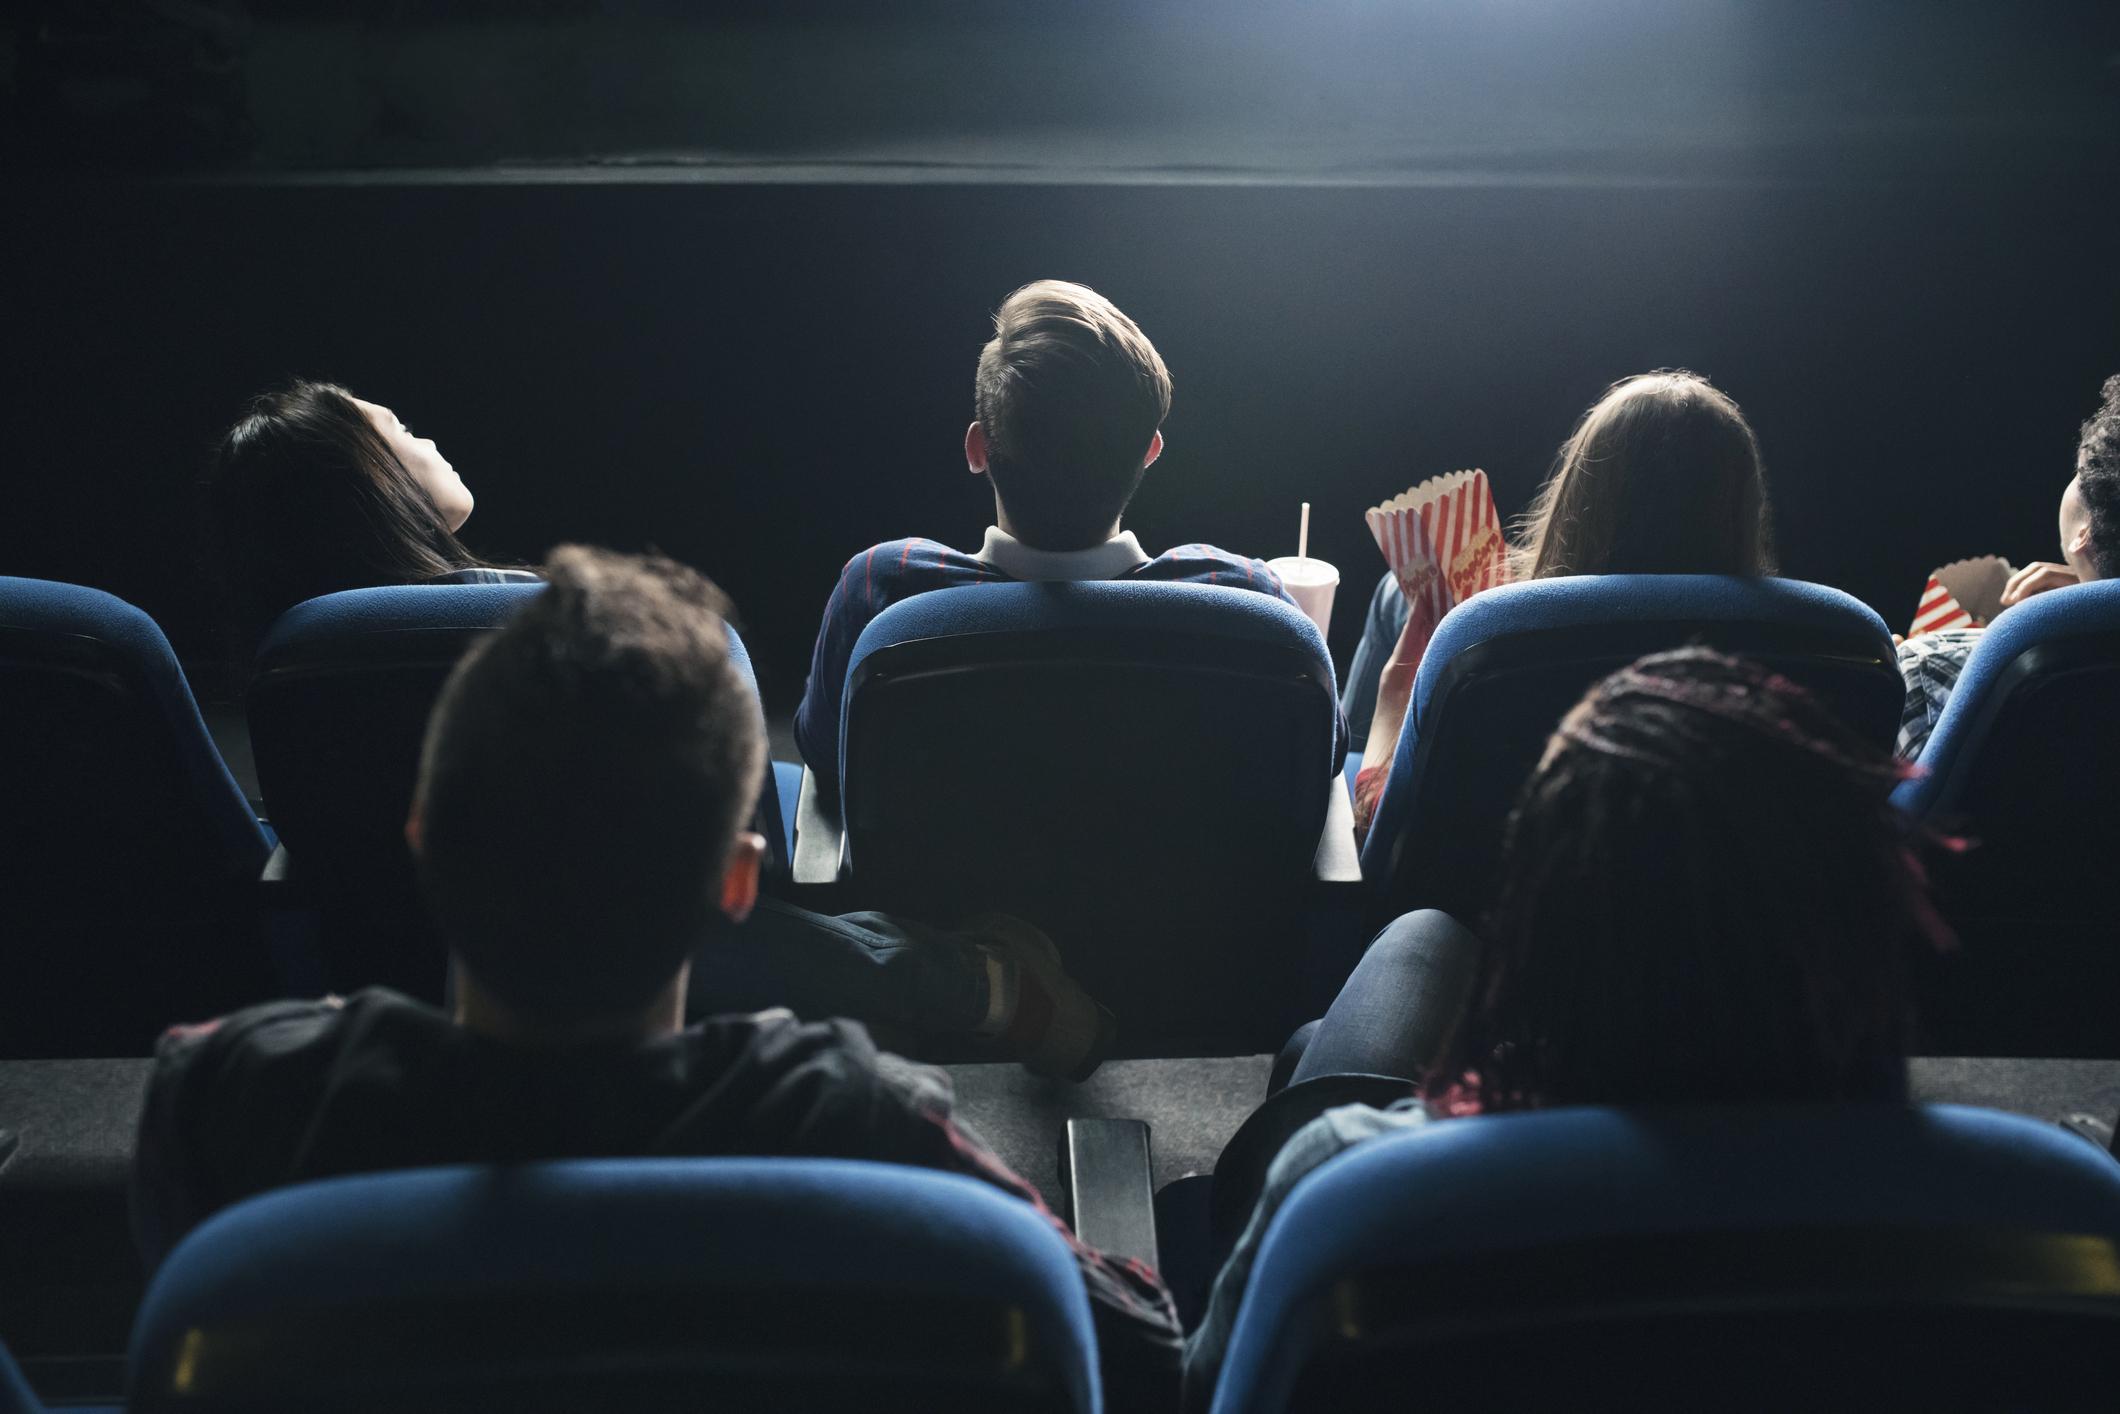 Friday Movies at Main | Tacoma Public Library